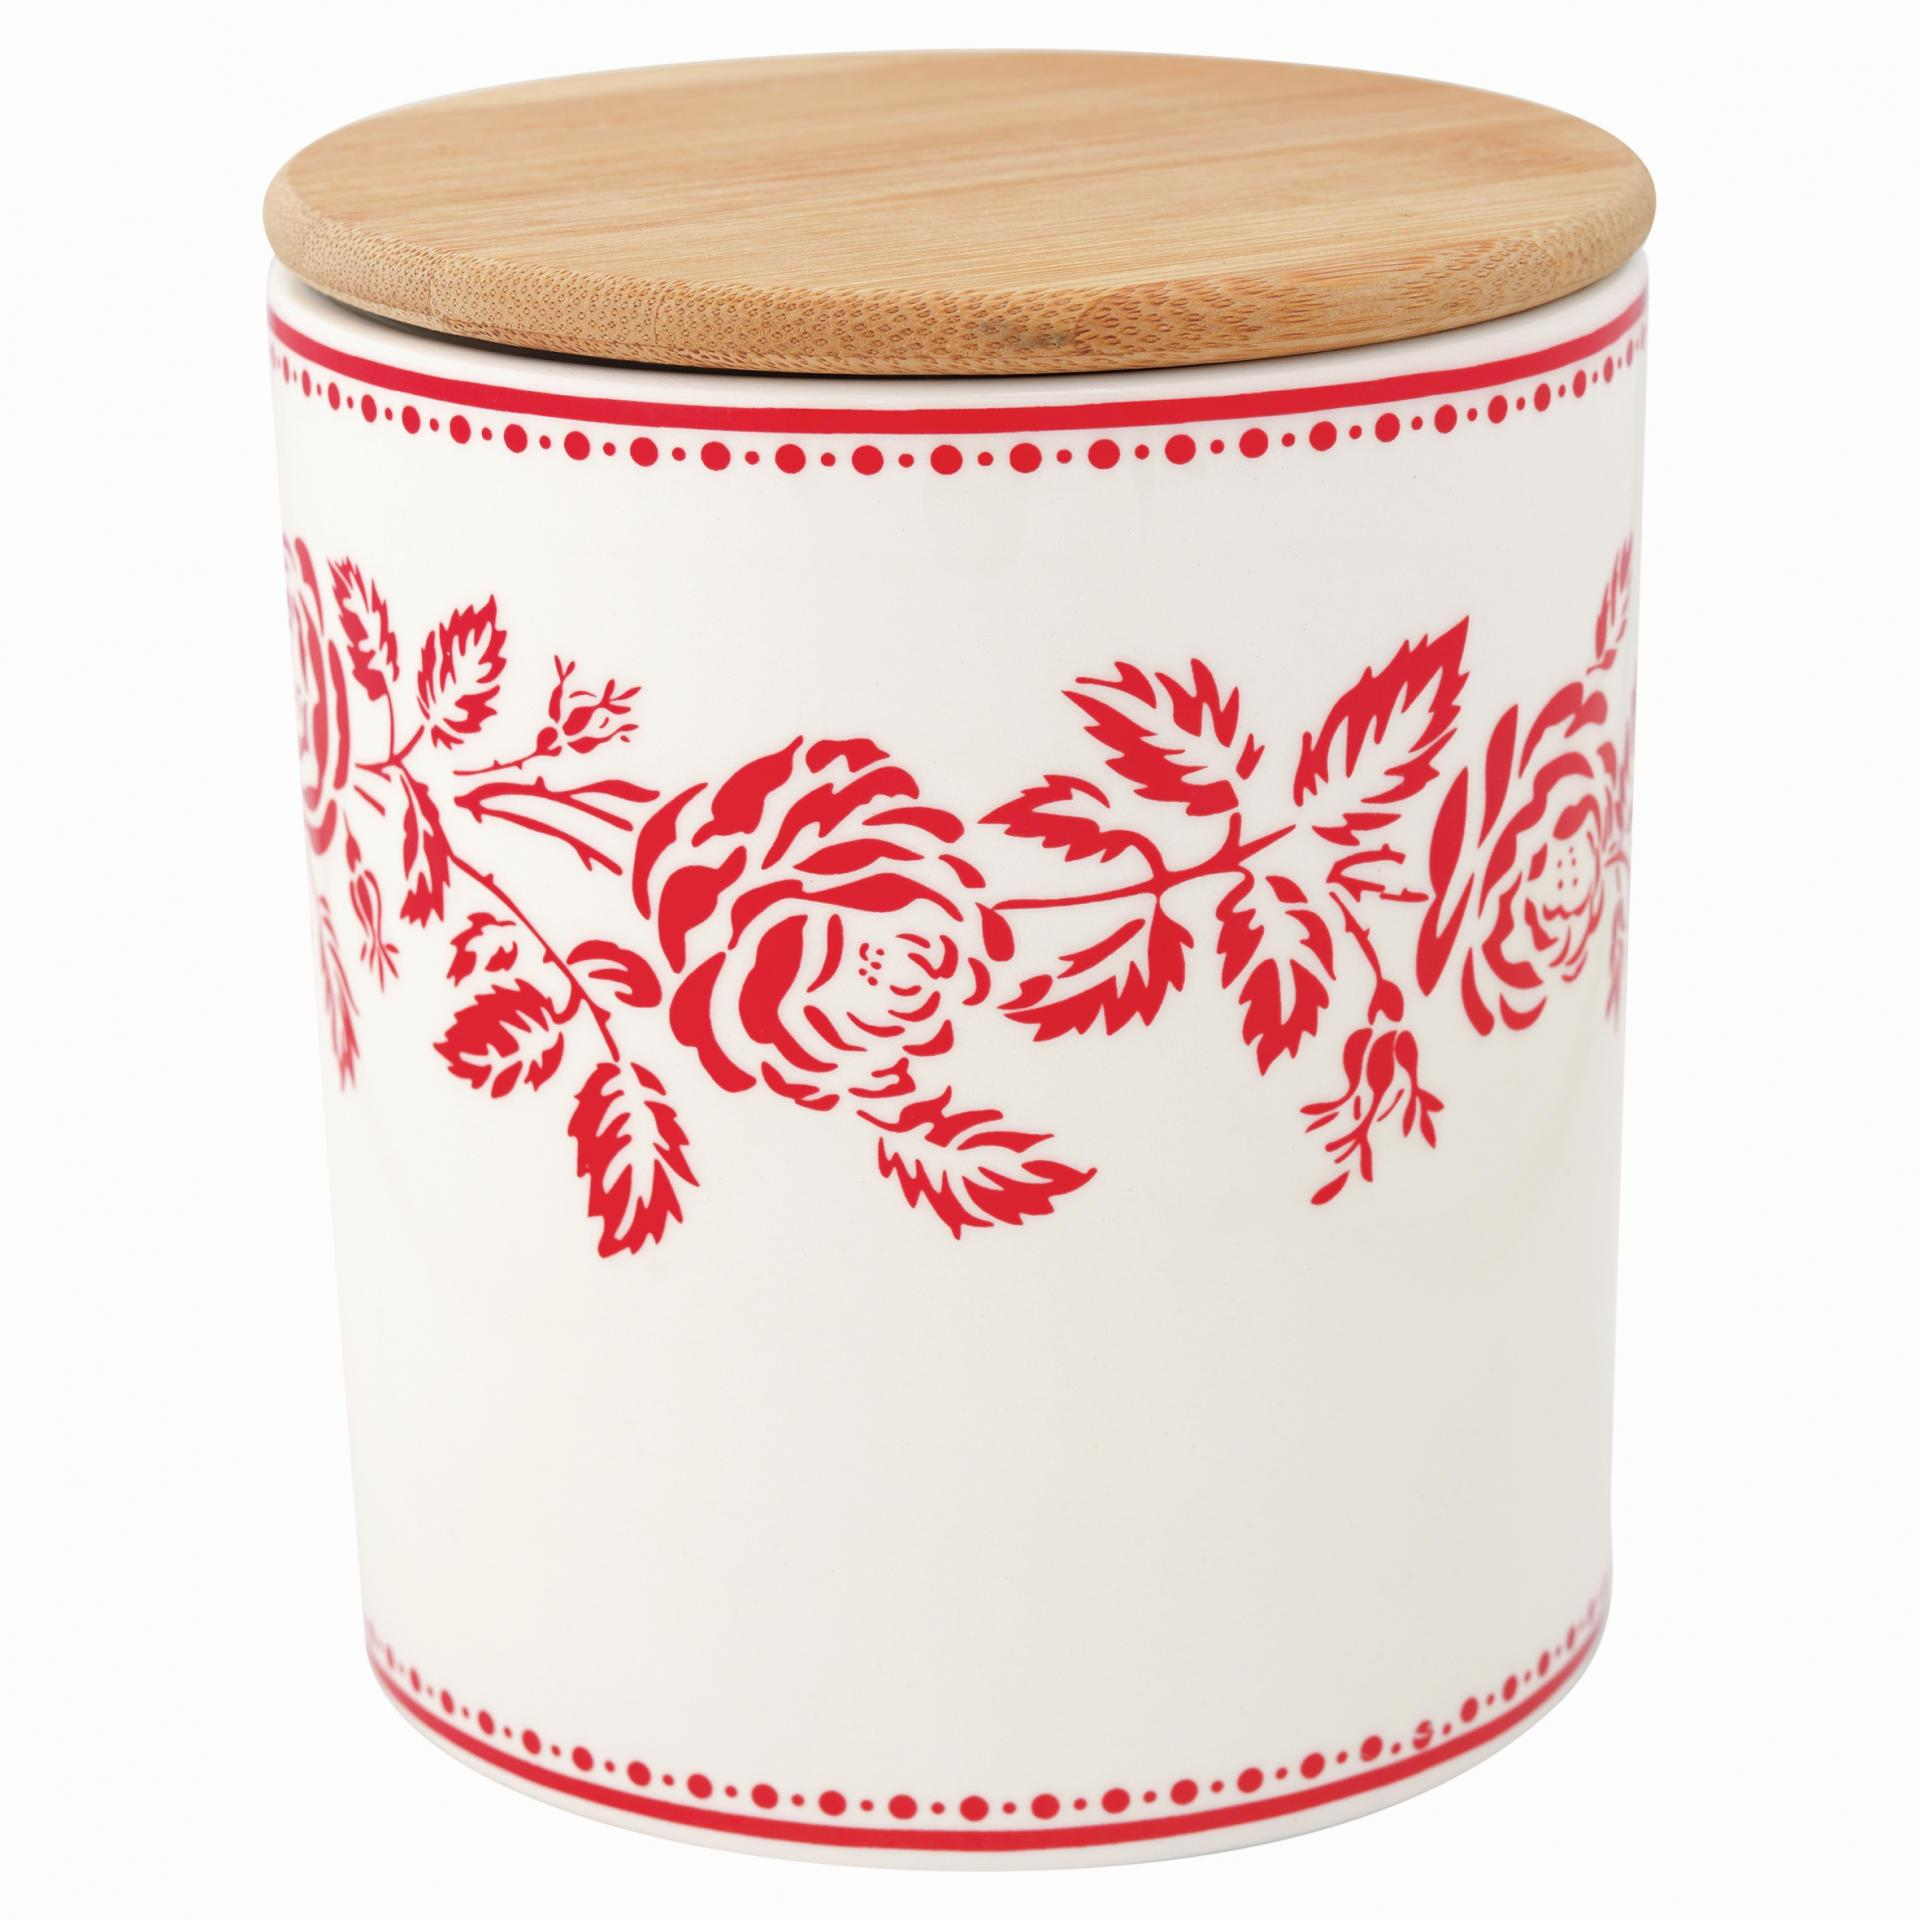 GREEN GATE Keramická dóza s dřevěným víkem Fleur red, červená barva, bílá barva, keramika